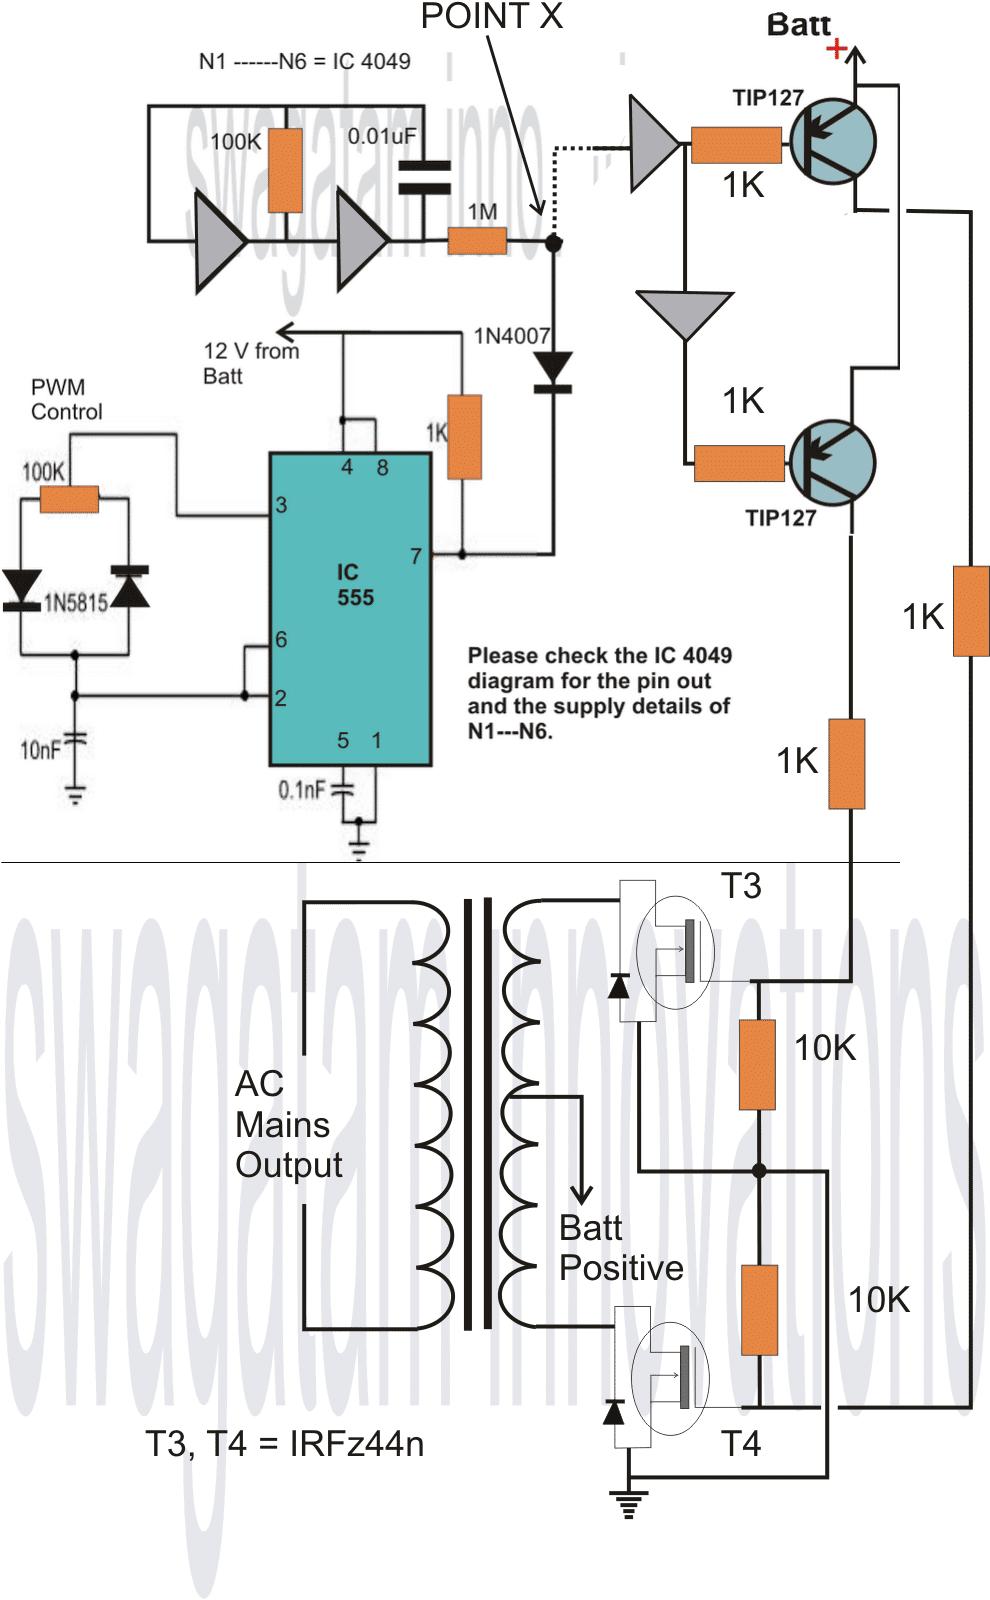 hight resolution of homemade 2000 va power inverter circuit homemade circuit projects